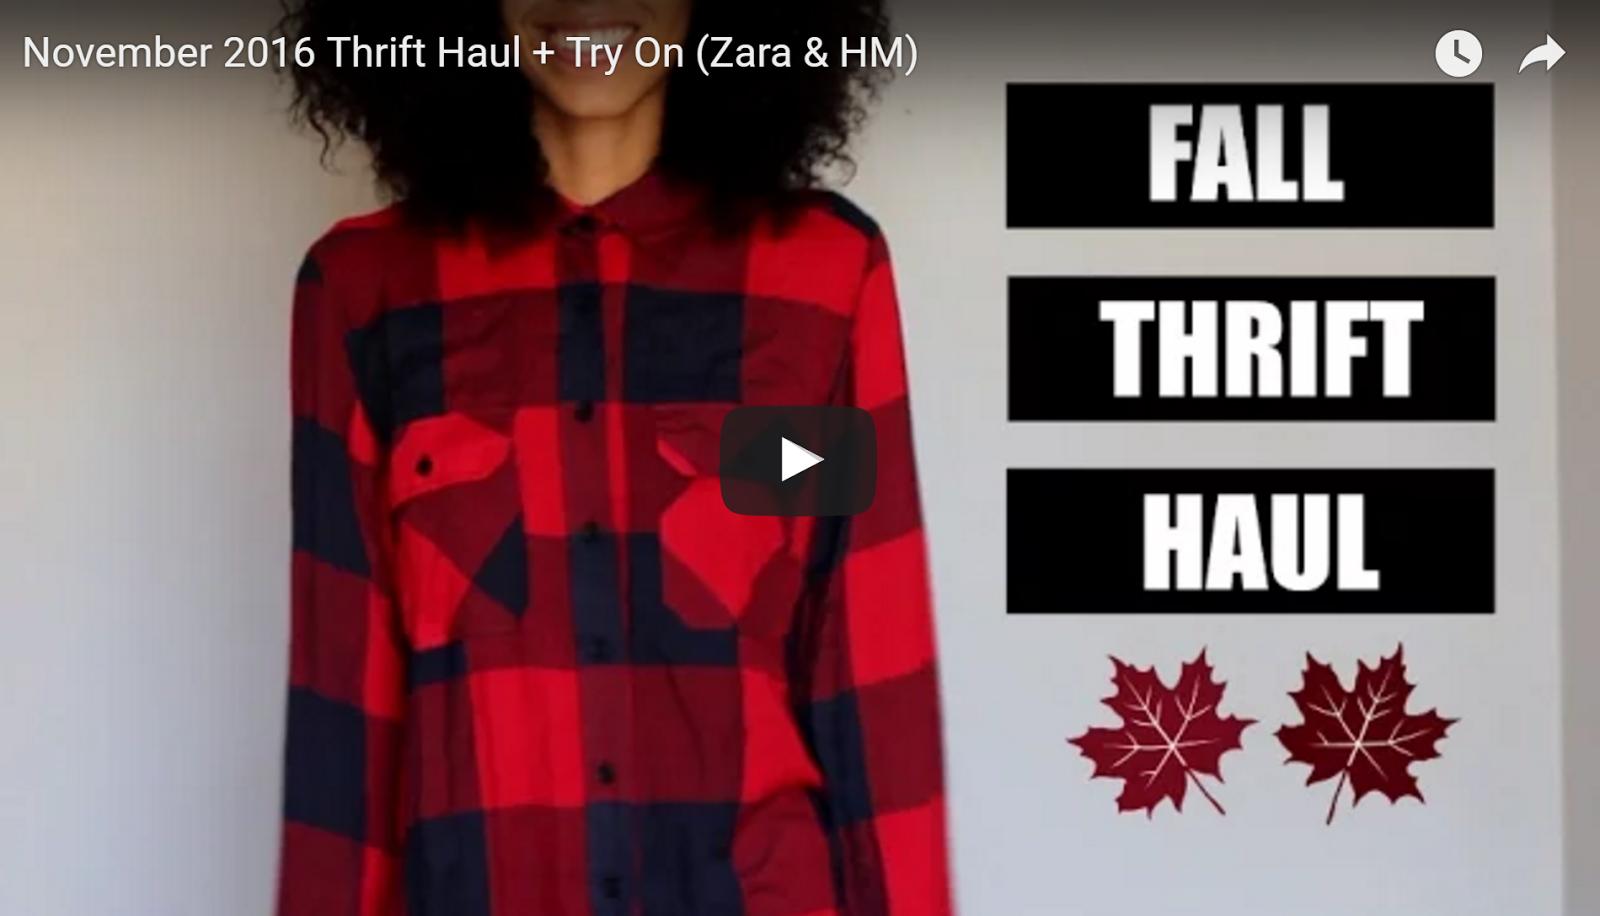 Fall Thrift Haul